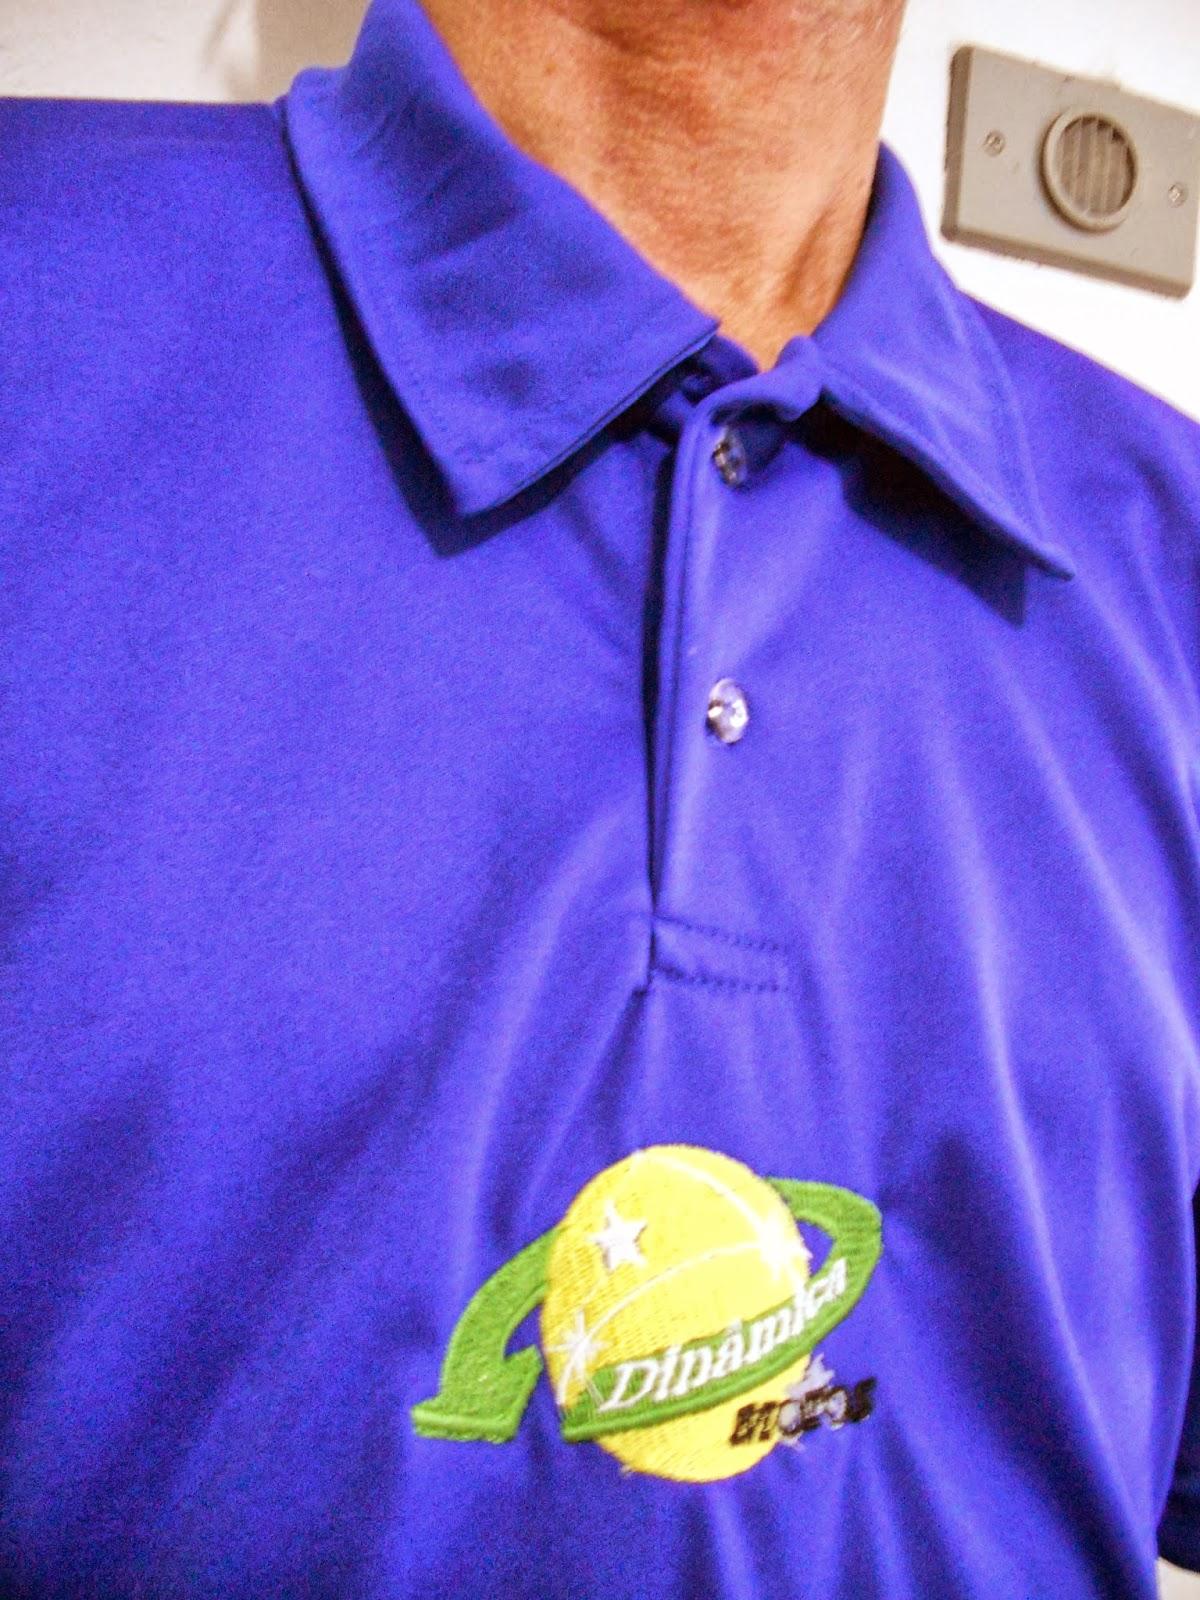 a001aad967 Camisa Polo de helanca - Fertel Uniformes e bordados